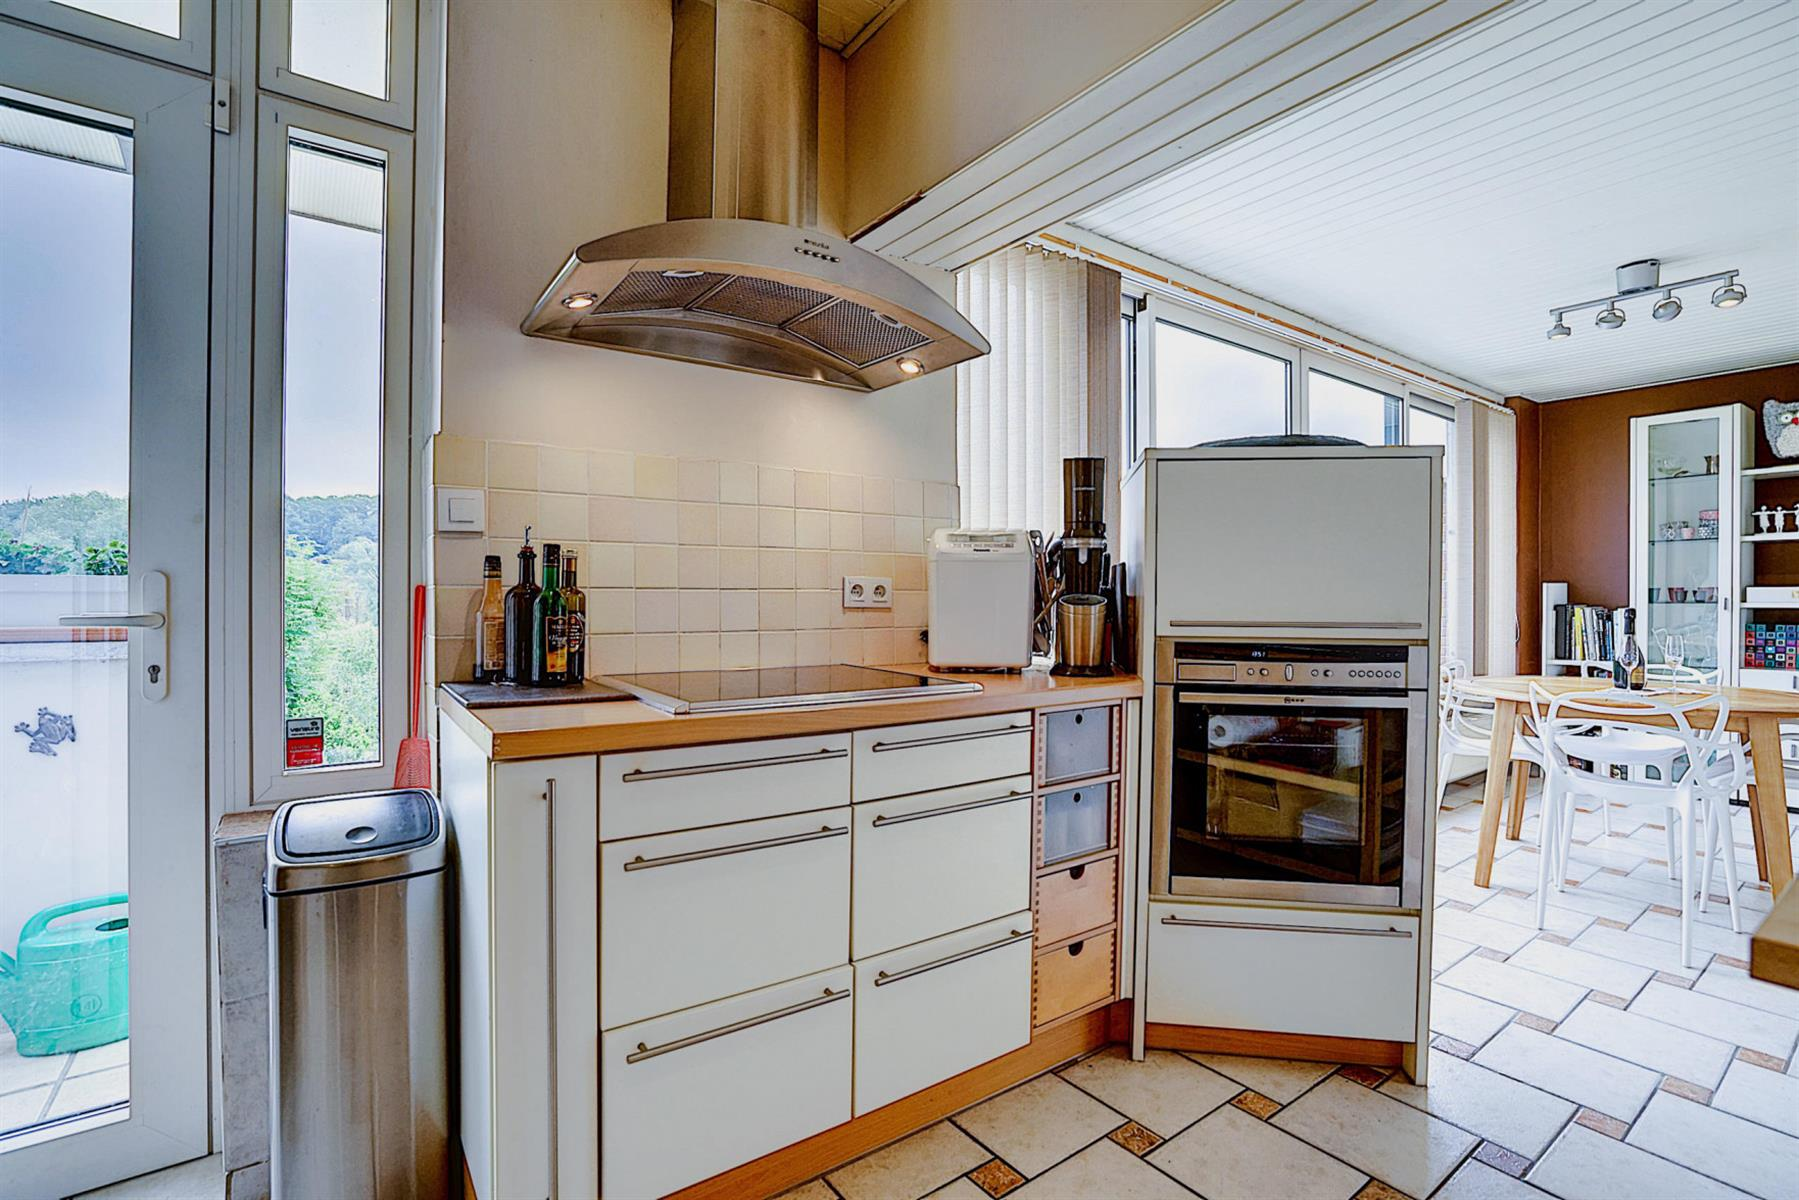 Maison - Bousval - #4395358-11